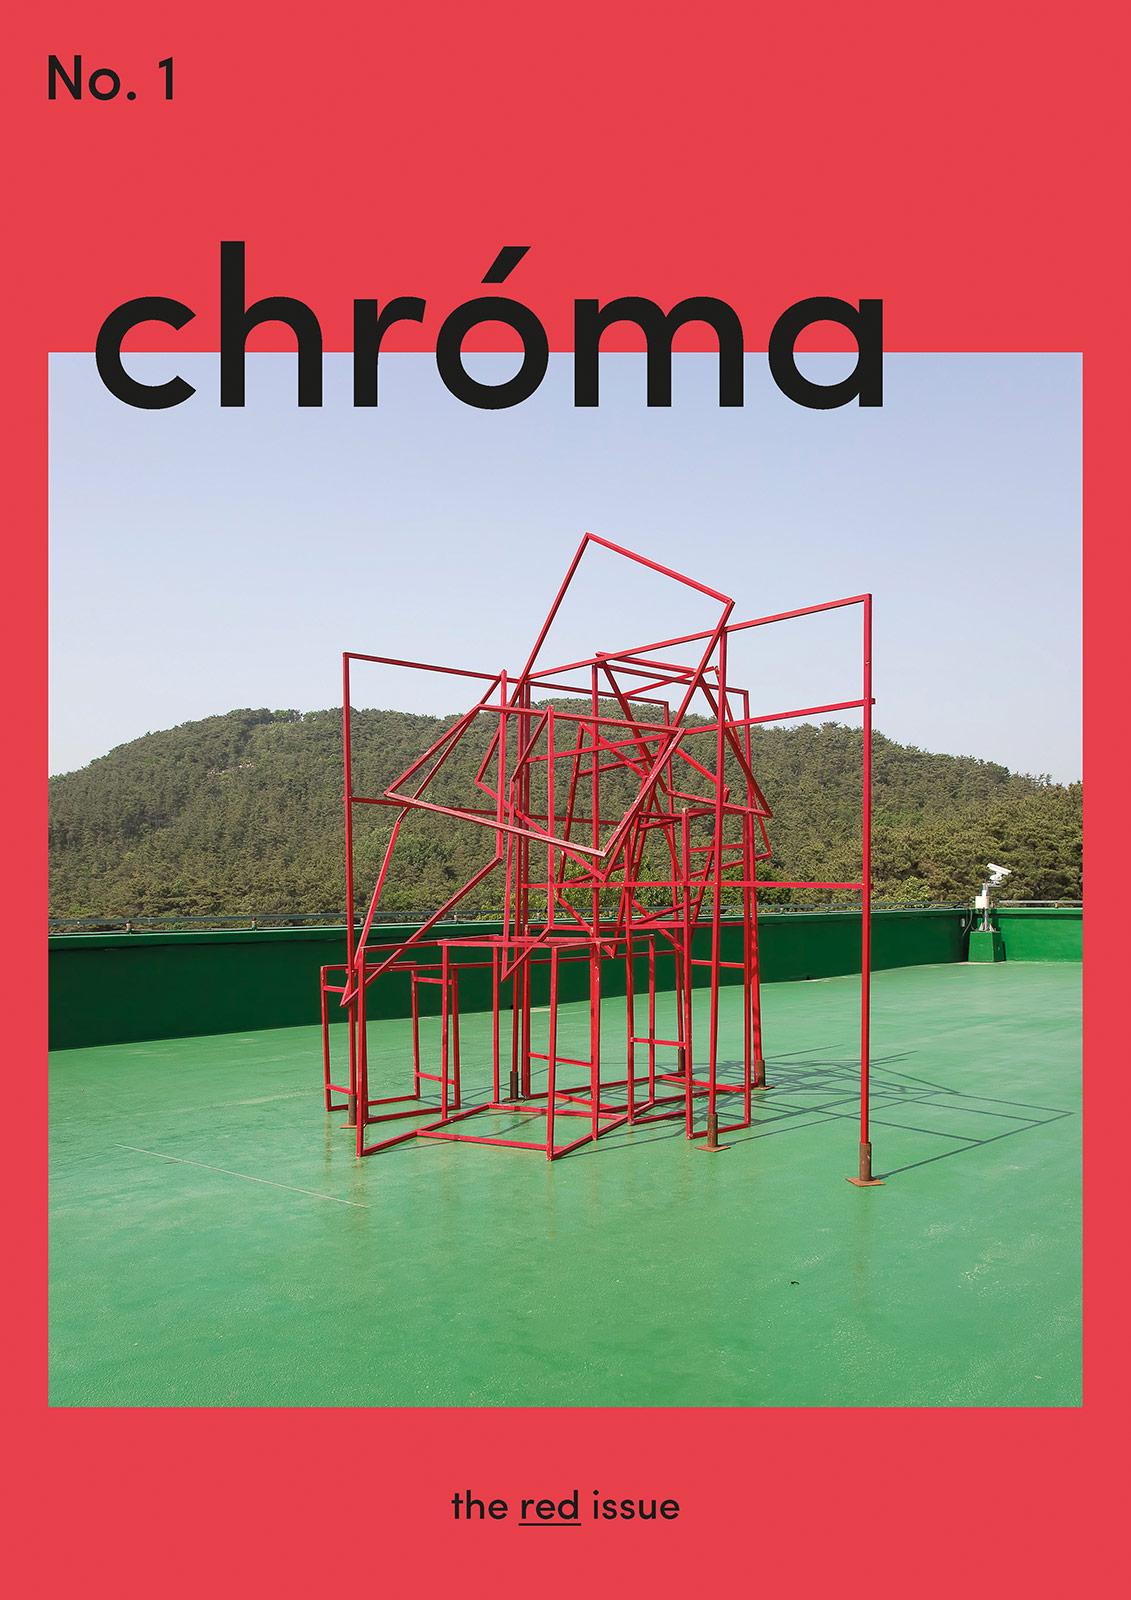 Chroma 1